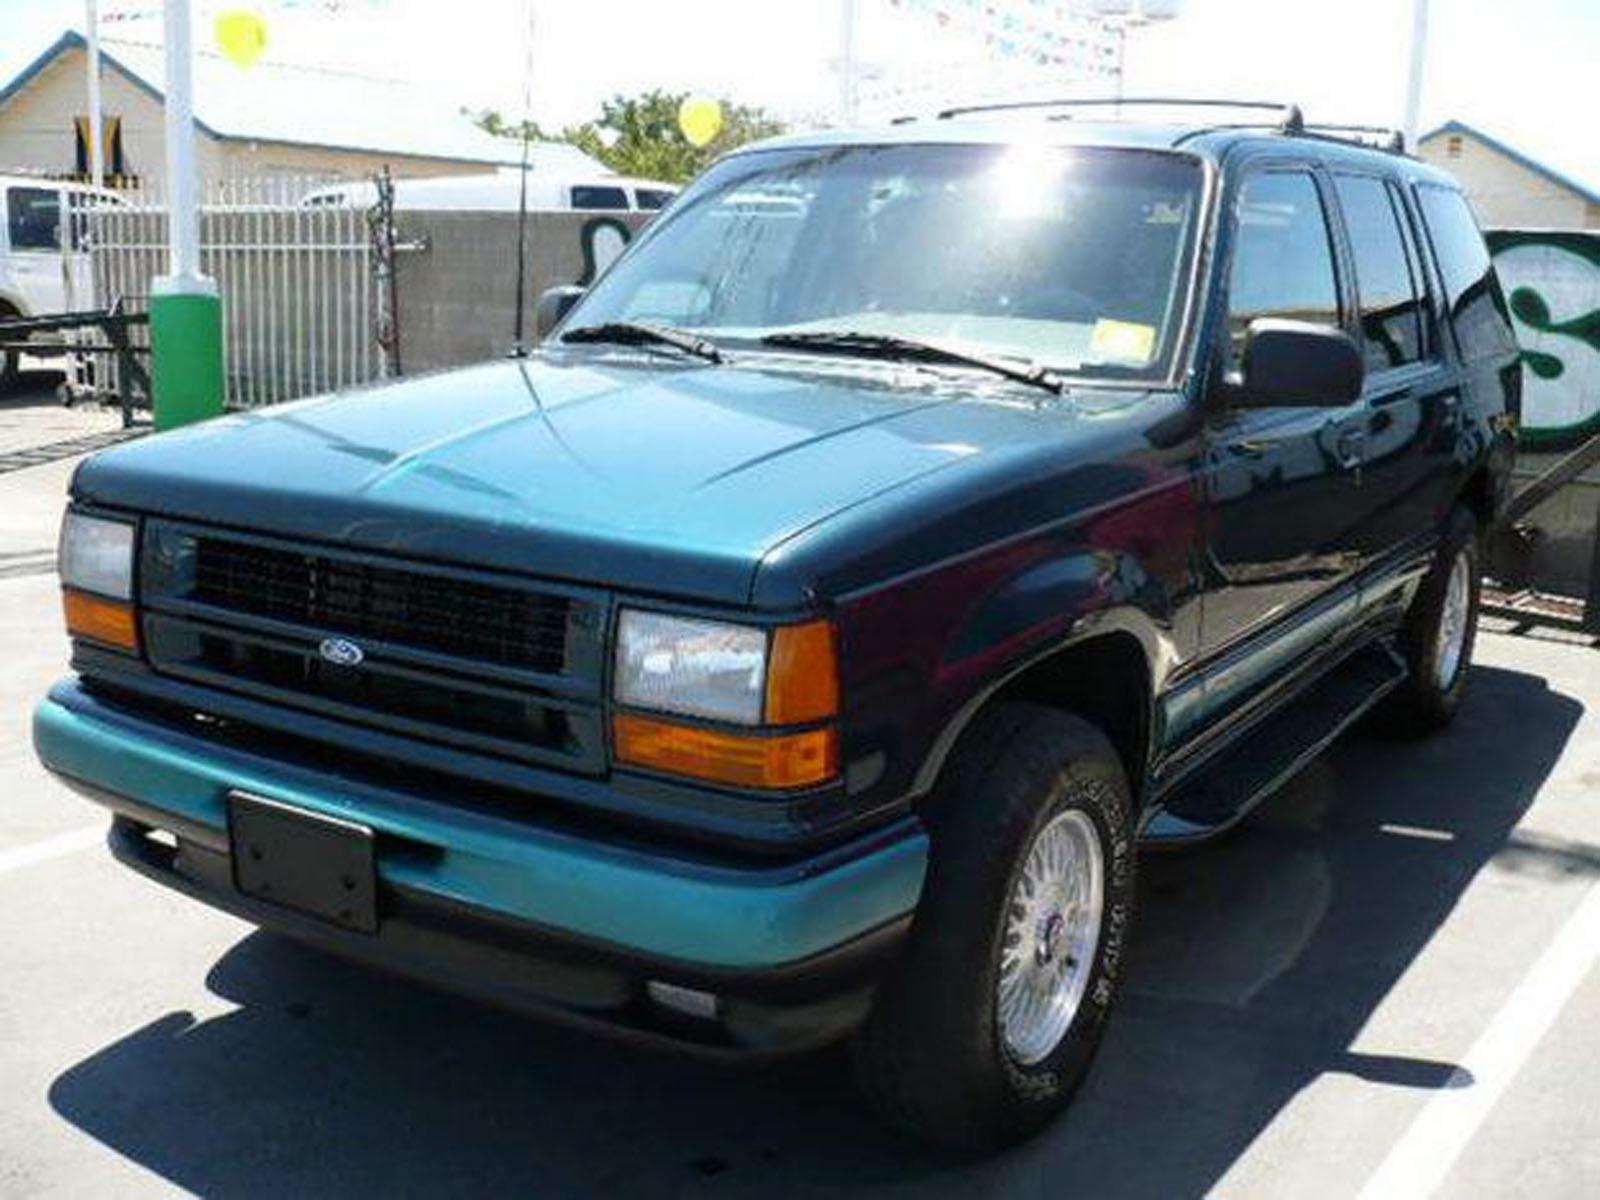 800 1024 1280 1600 origin 1993 Ford Explorer ...